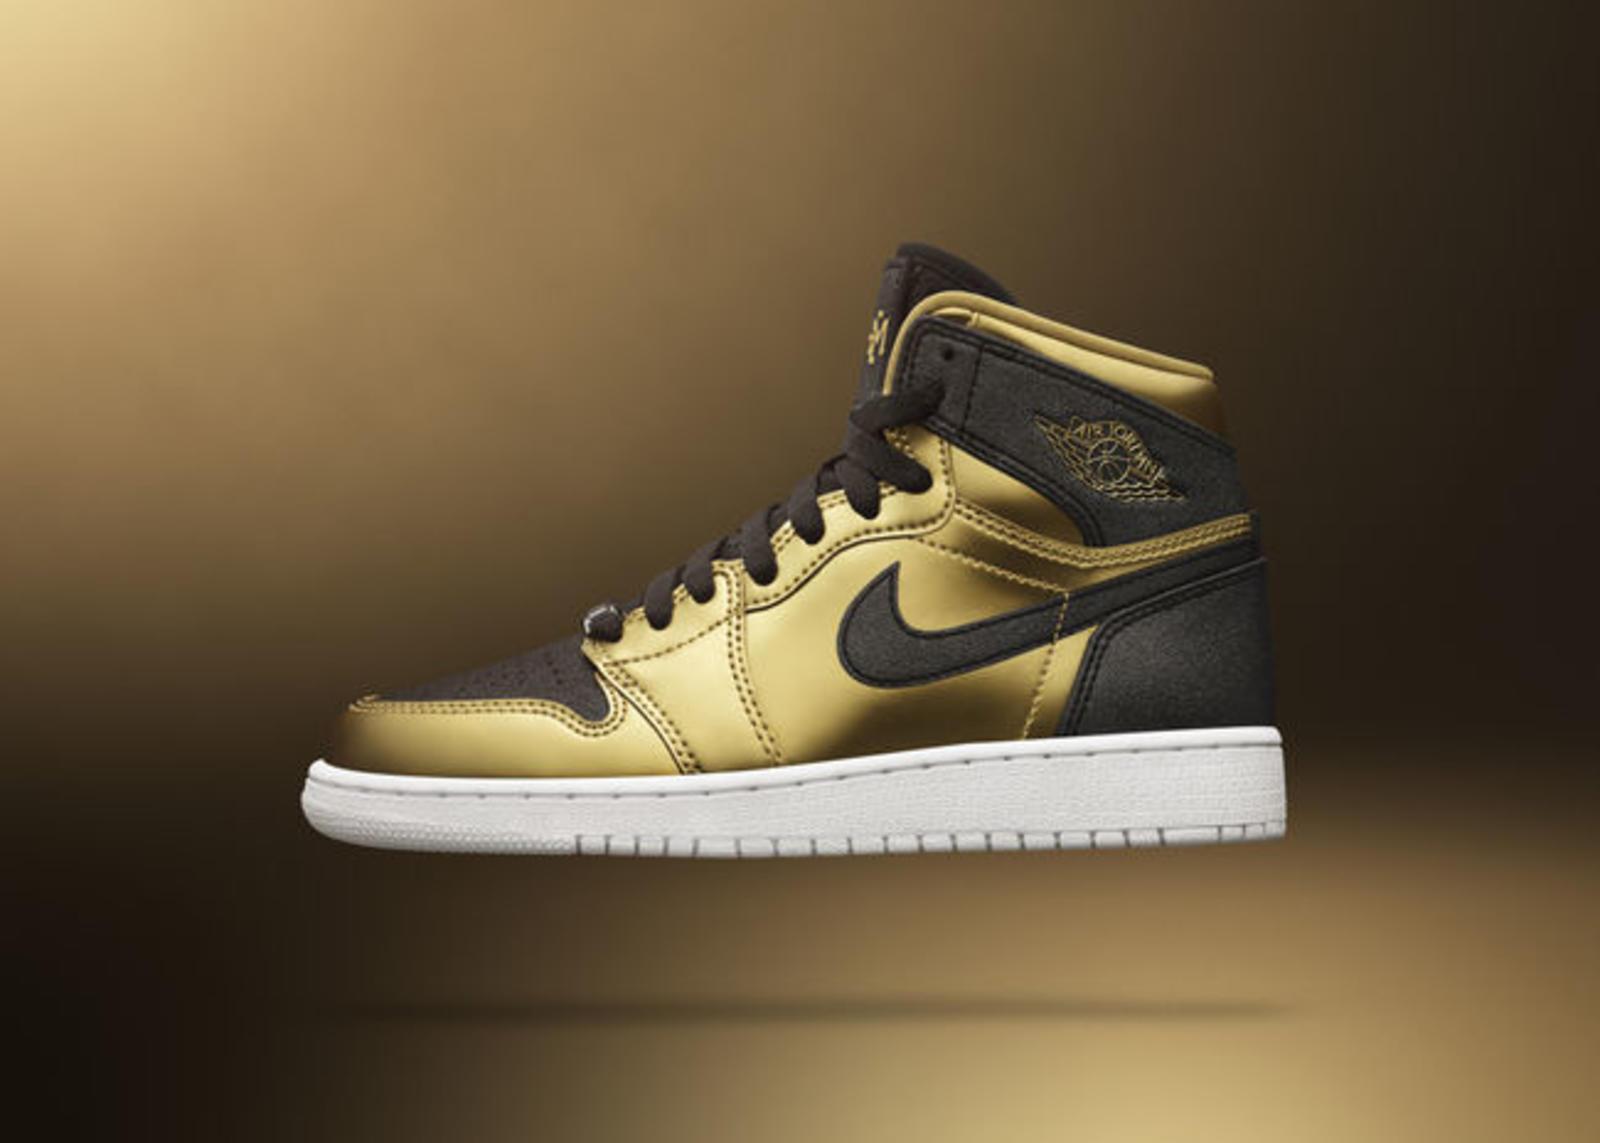 Nike Jordan Air Jordan Zapatos De Verano en Negro: 10 ...